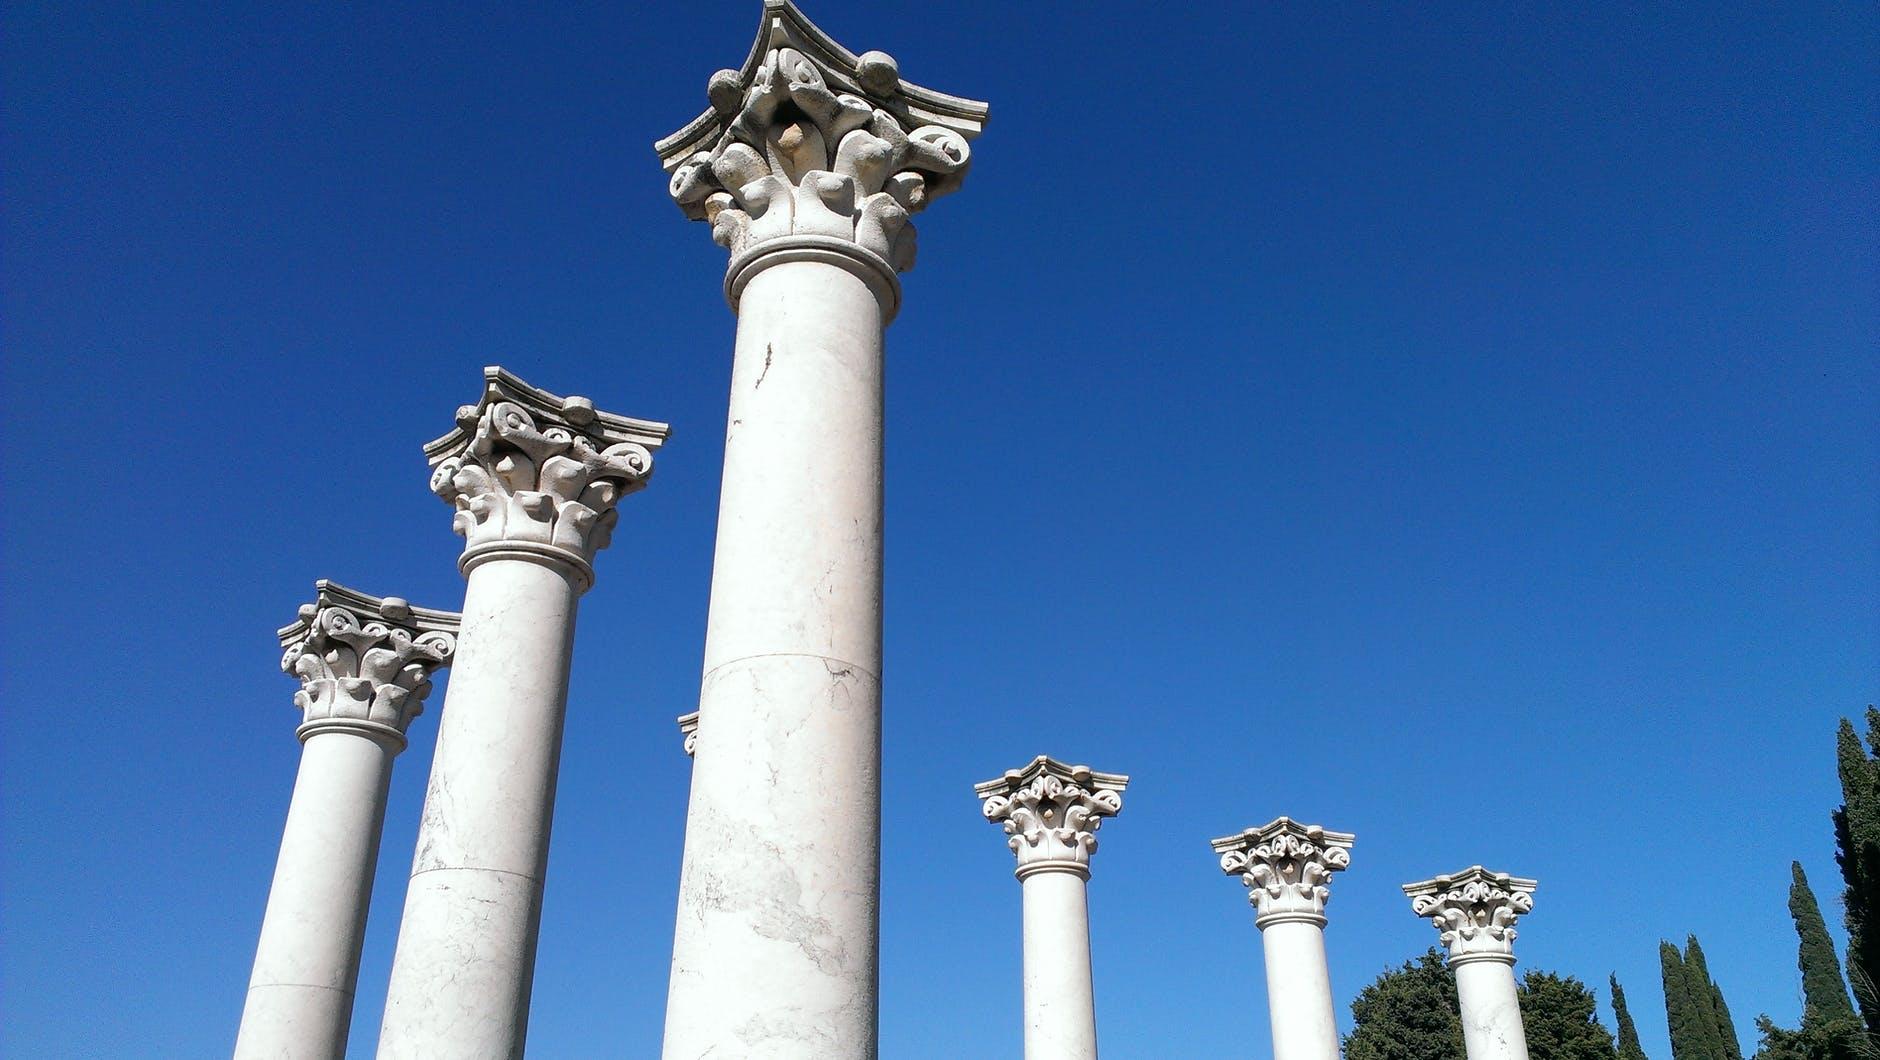 classic stone columns on blue sky